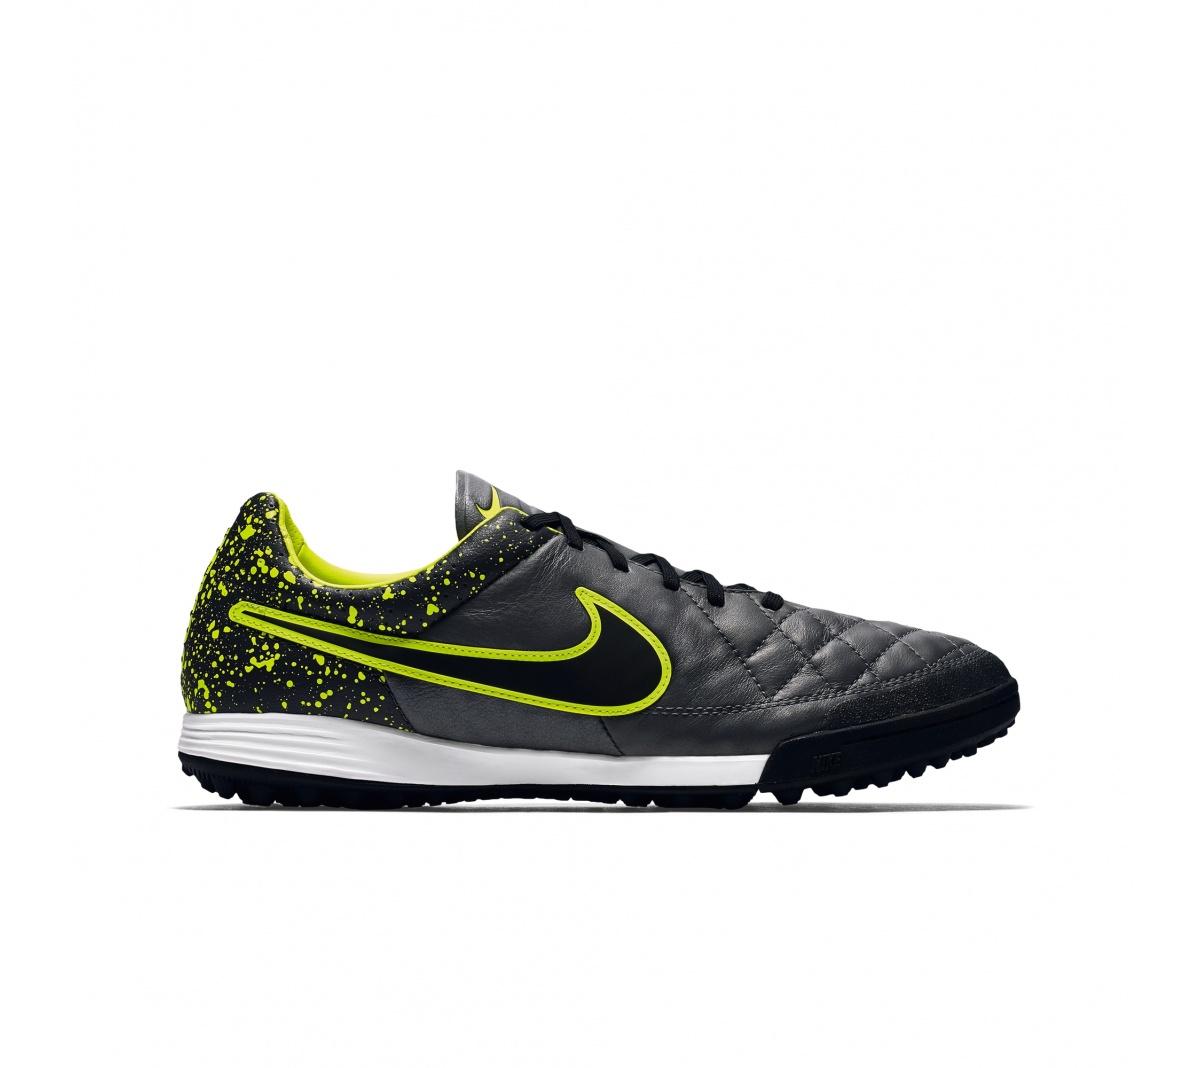 Chuteira Nike Tiempo Legacy Society Chuteira Nike Tiempo Legacy Society ... b89bad0f99f42